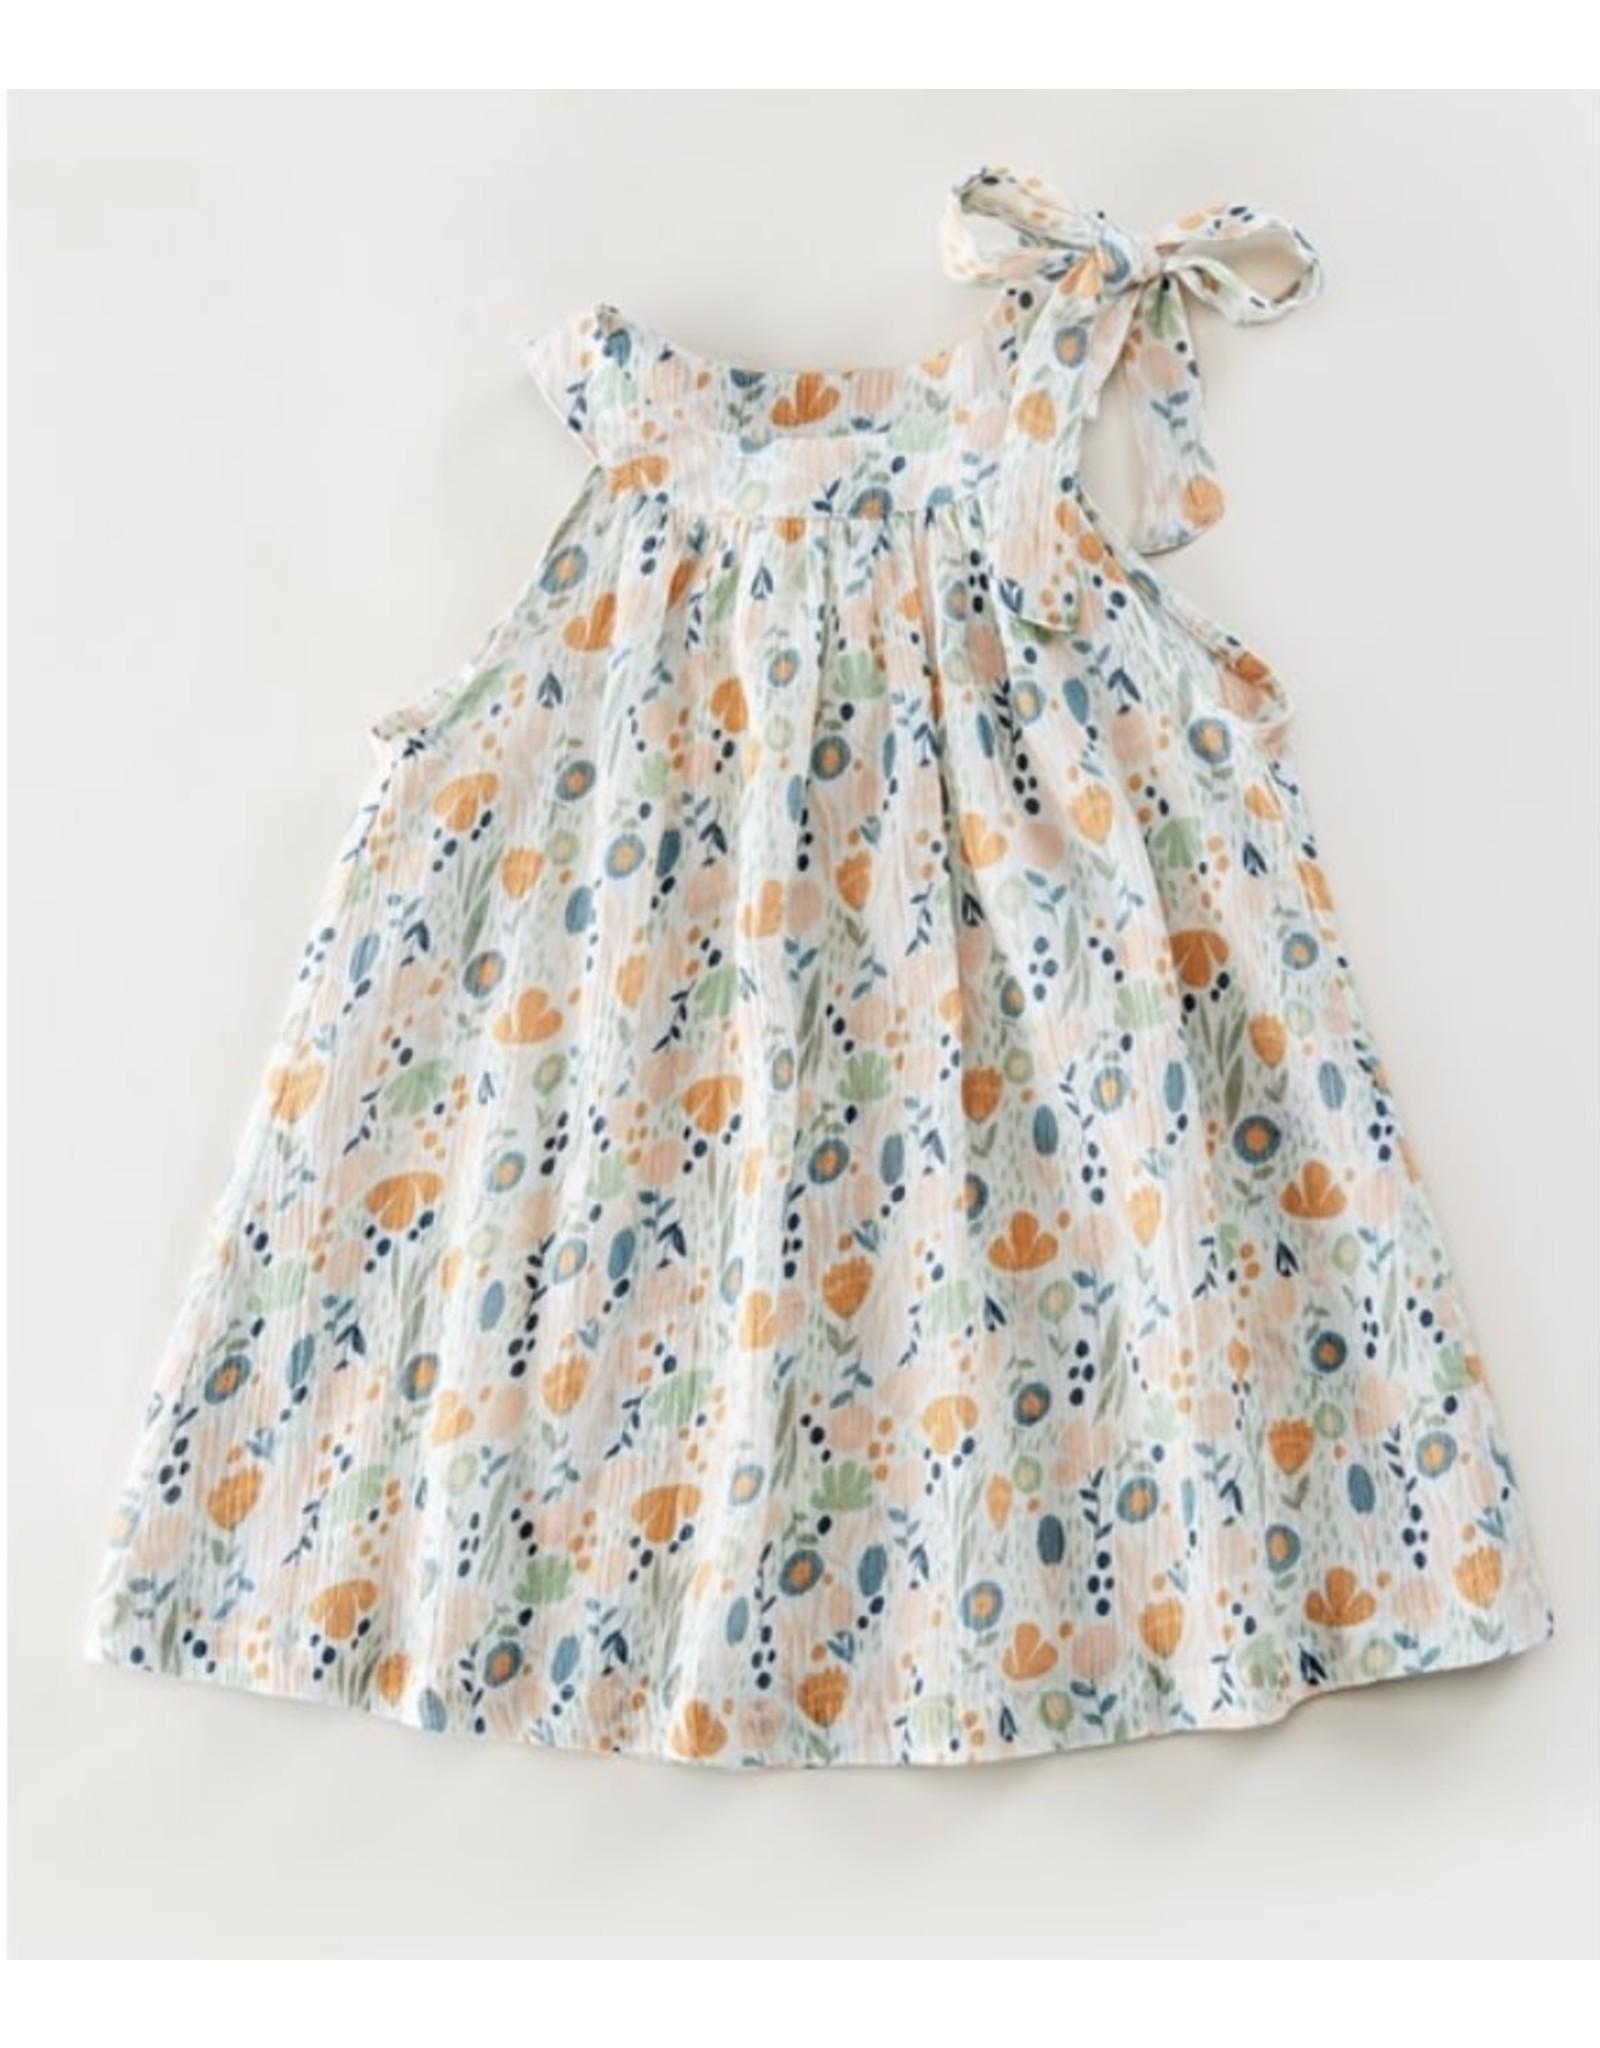 Cartwheels- Isabella Dress: Multicolor Floral